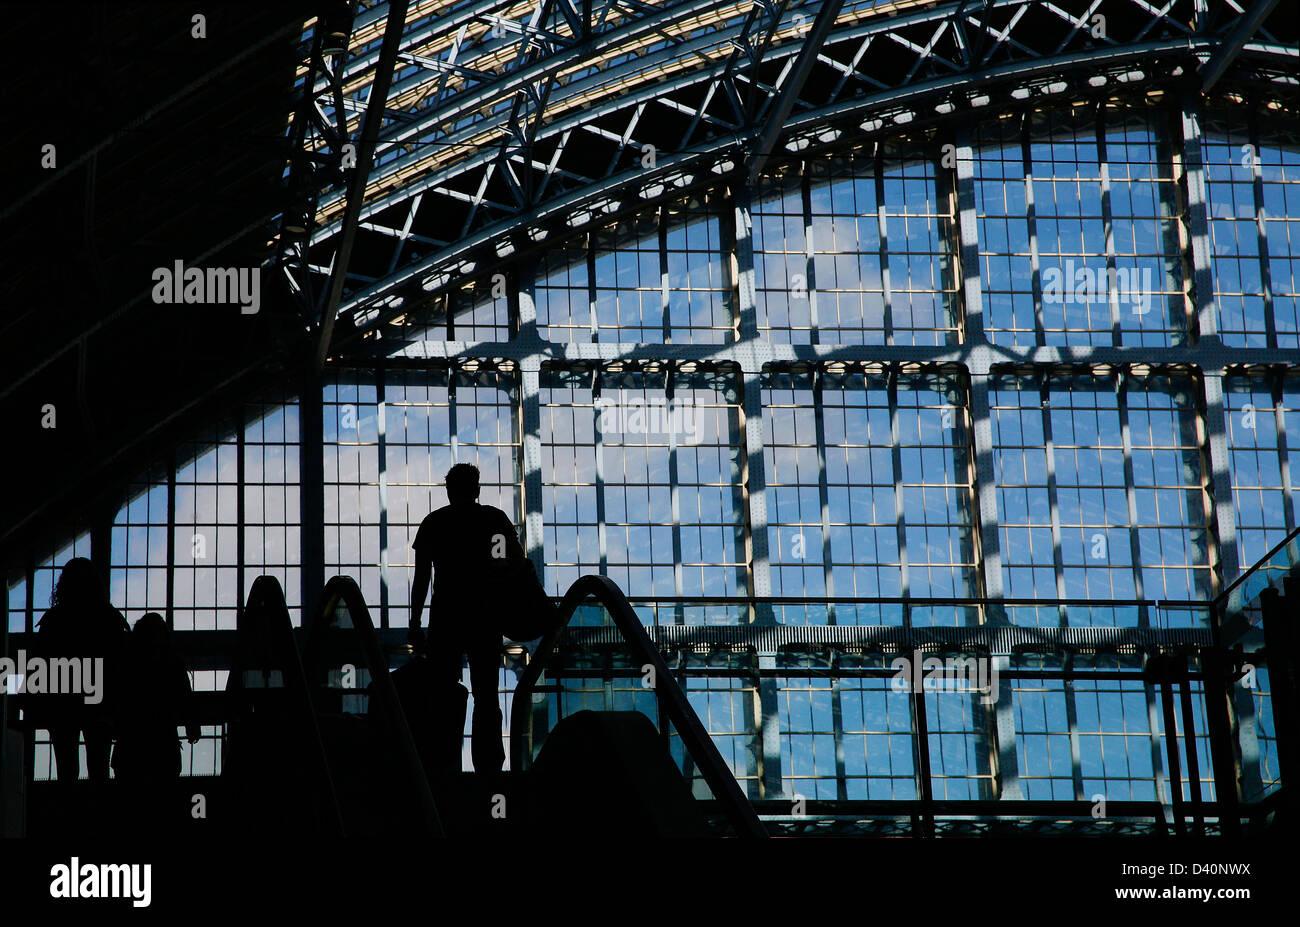 Barlow Shed roof at St Pancras International Eurostar train station kings cross London.silhouette  figures emerging - Stock Image